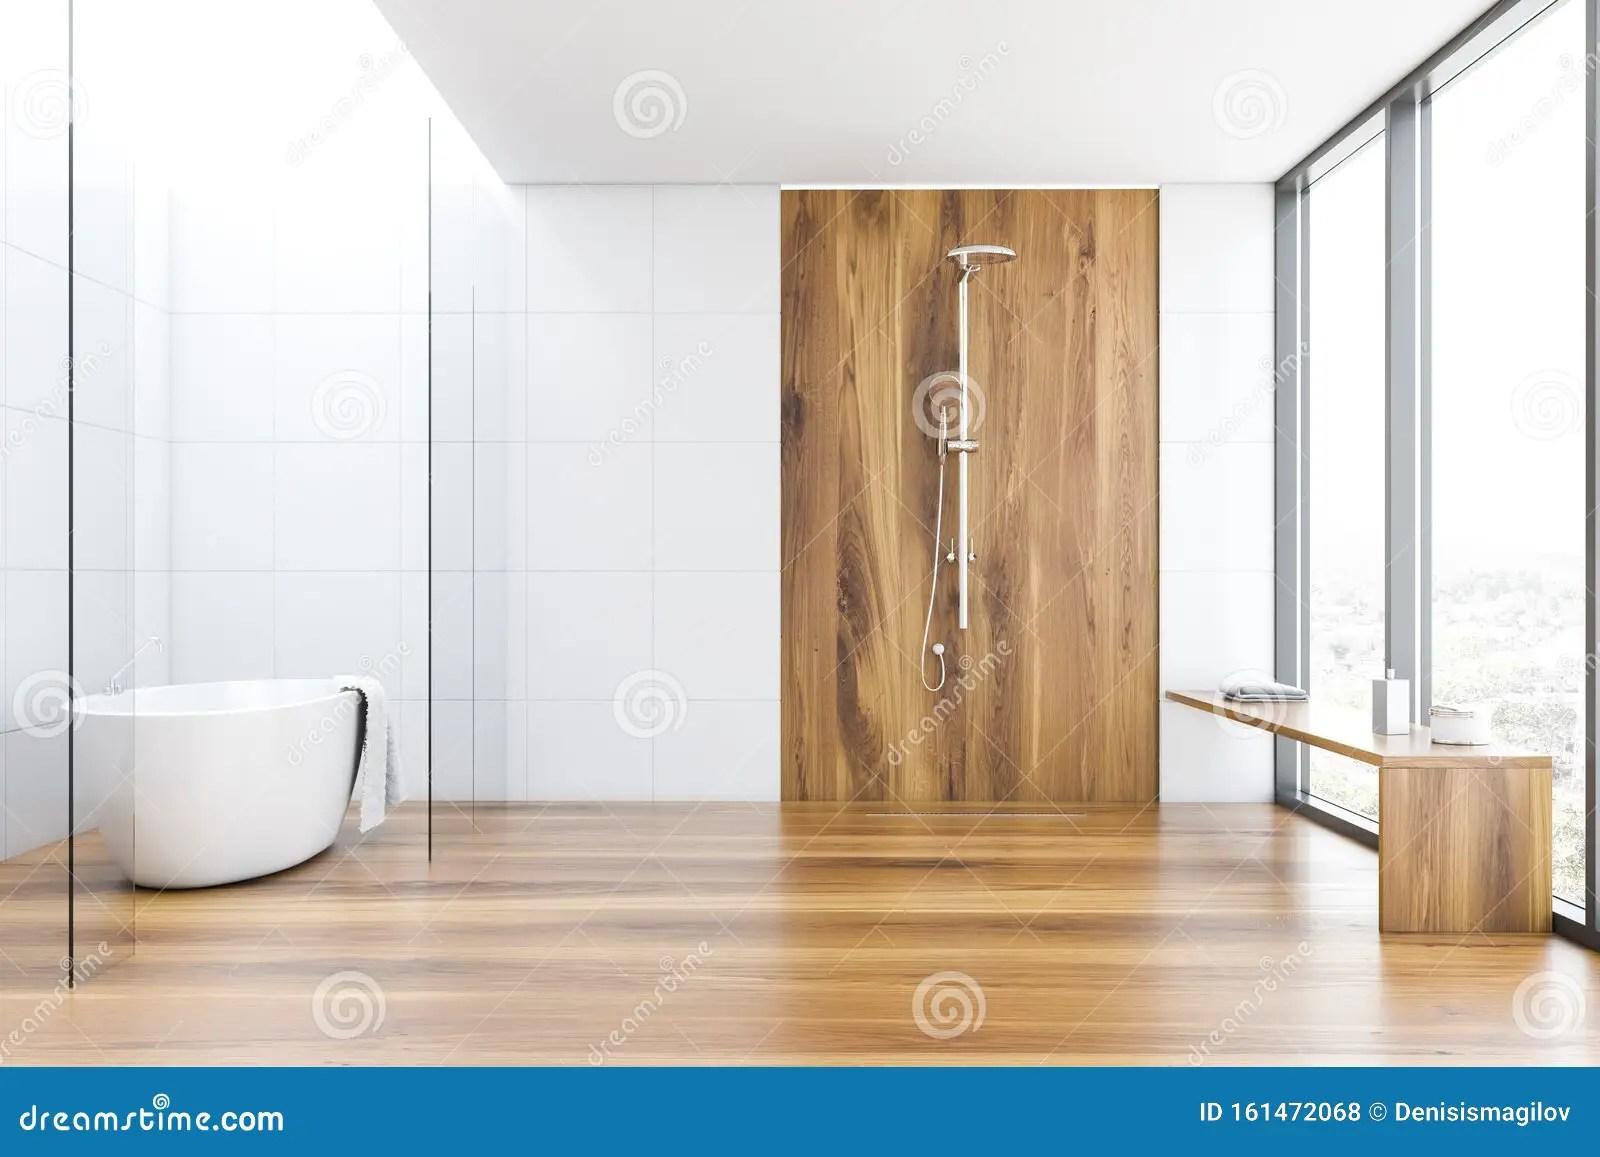 https www dreamstime com white tile wood bathroom tub shower interior comfortable glass walls wooden floor bathtub towel hanging vertical image161472068